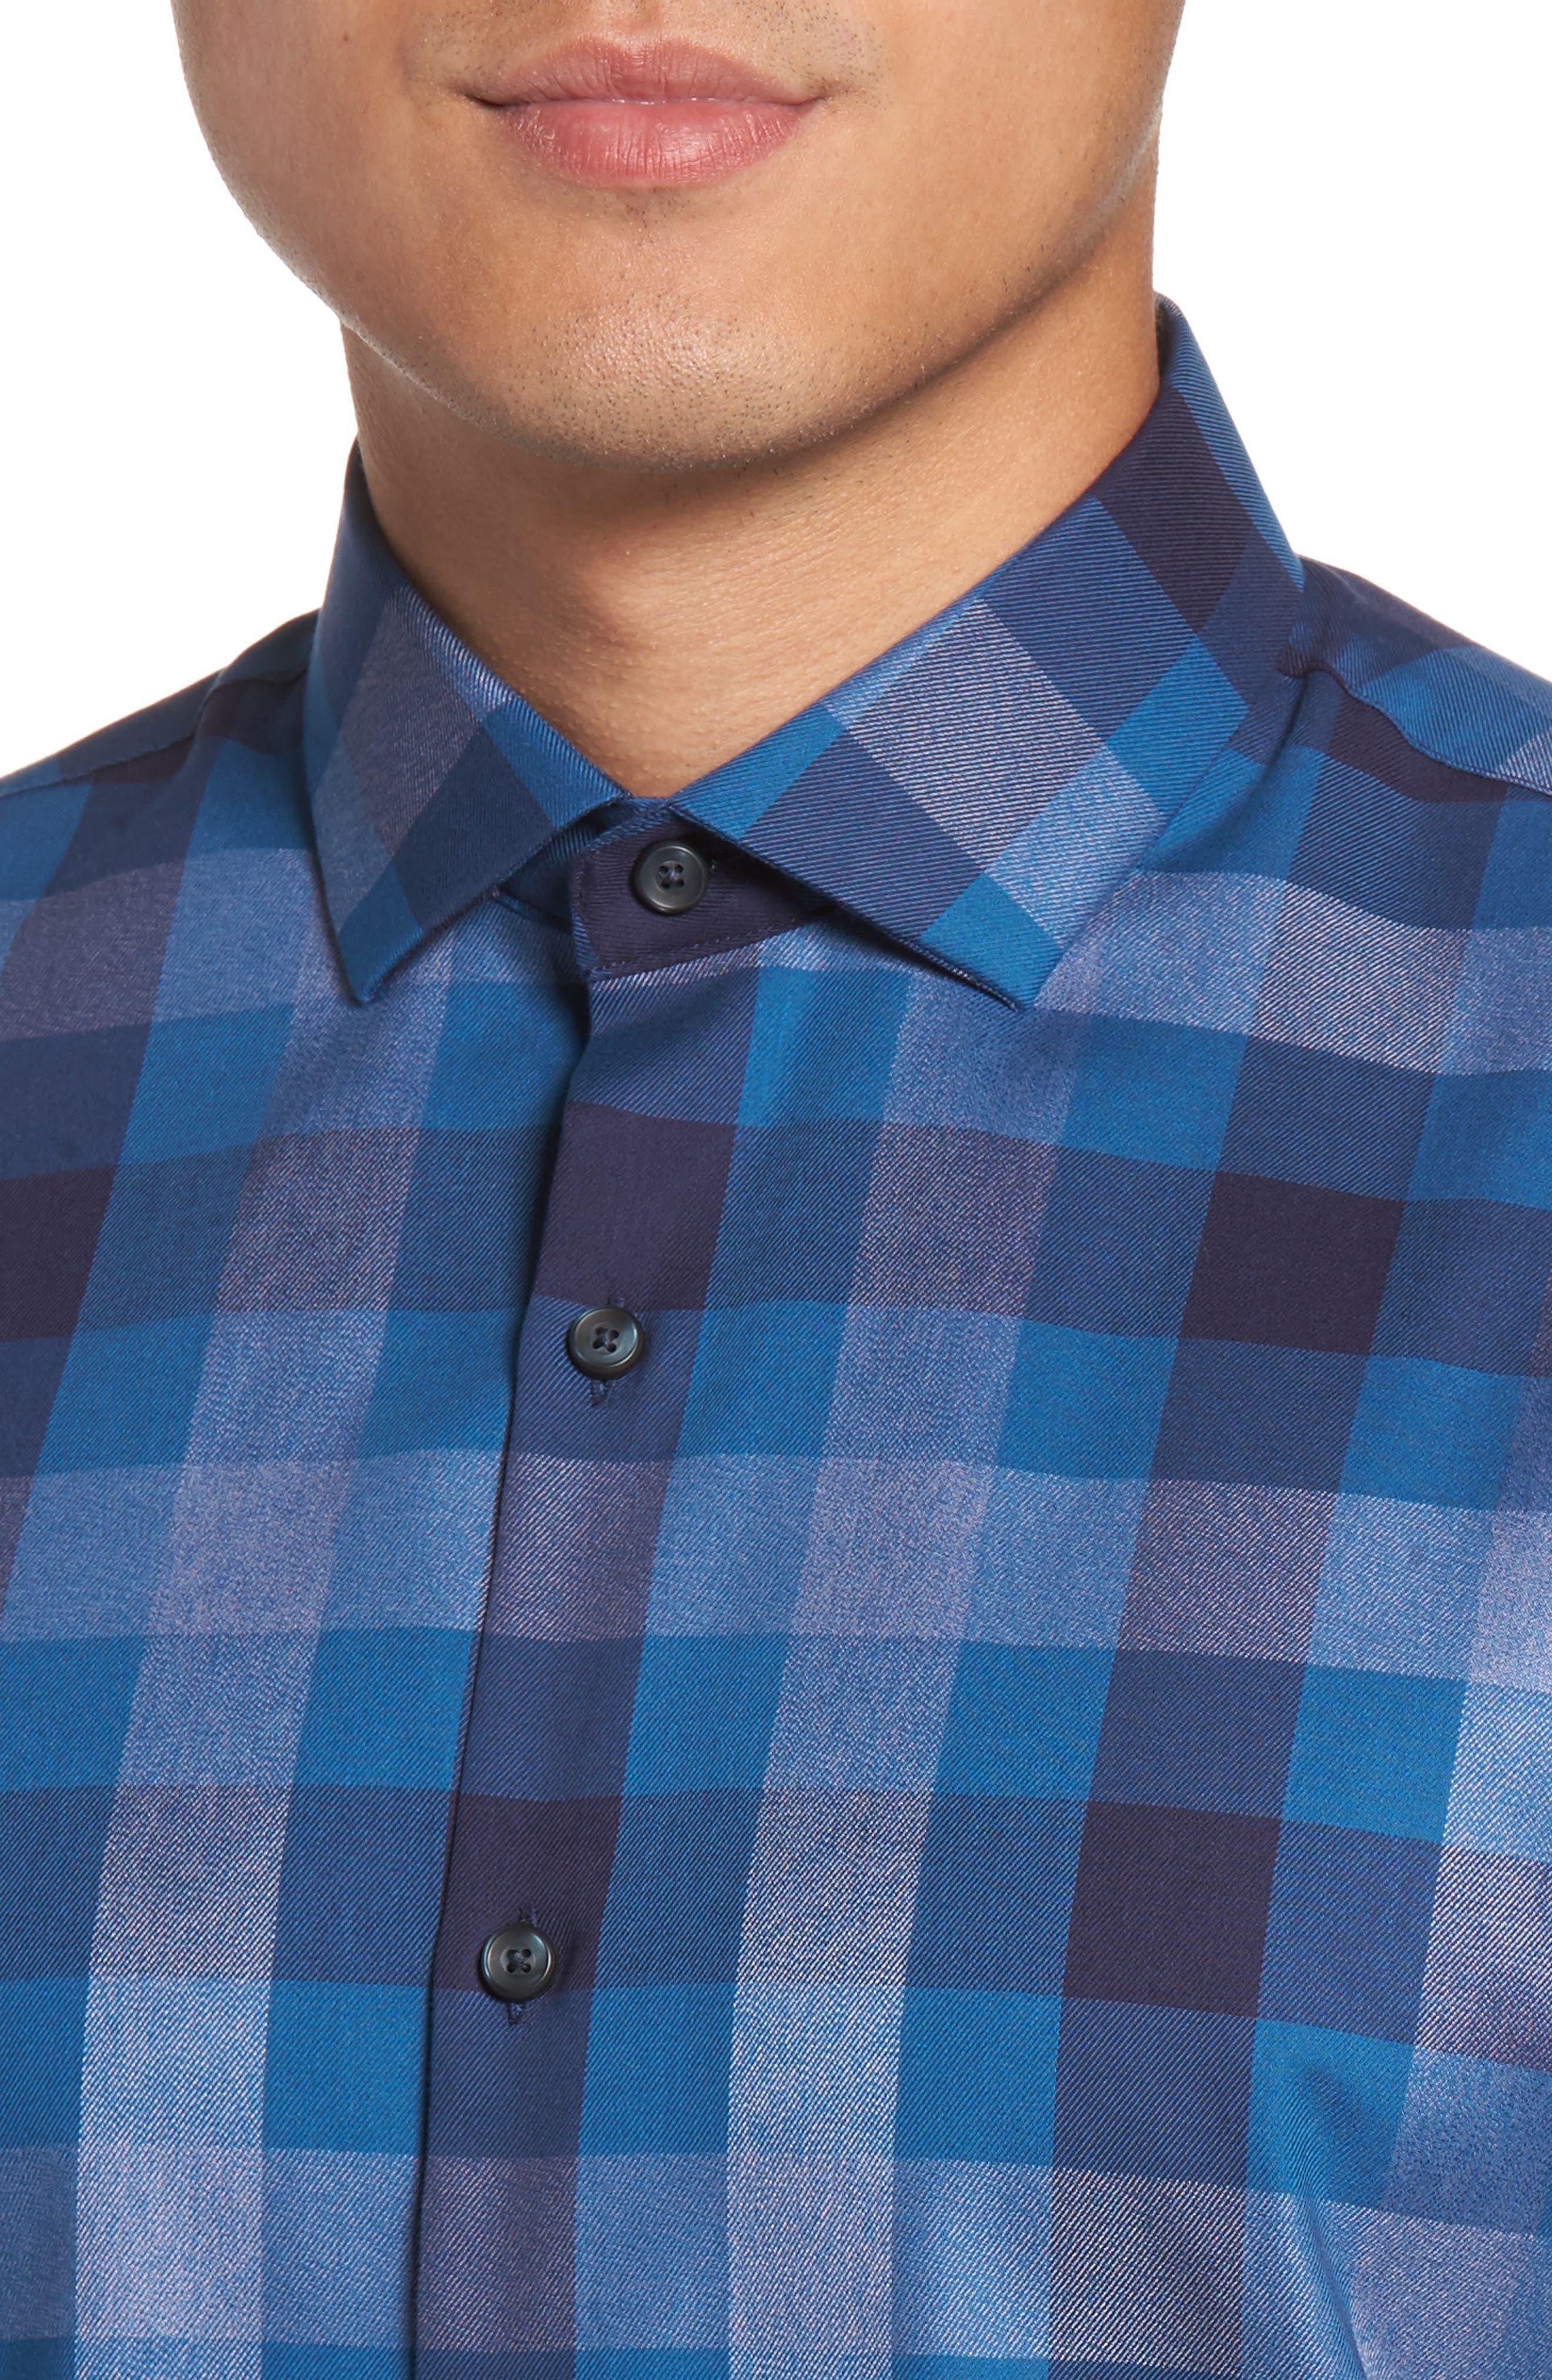 No-Iron Large Check Woven Shirt,                             Alternate thumbnail 4, color,                             Navy Dusk Heather Check